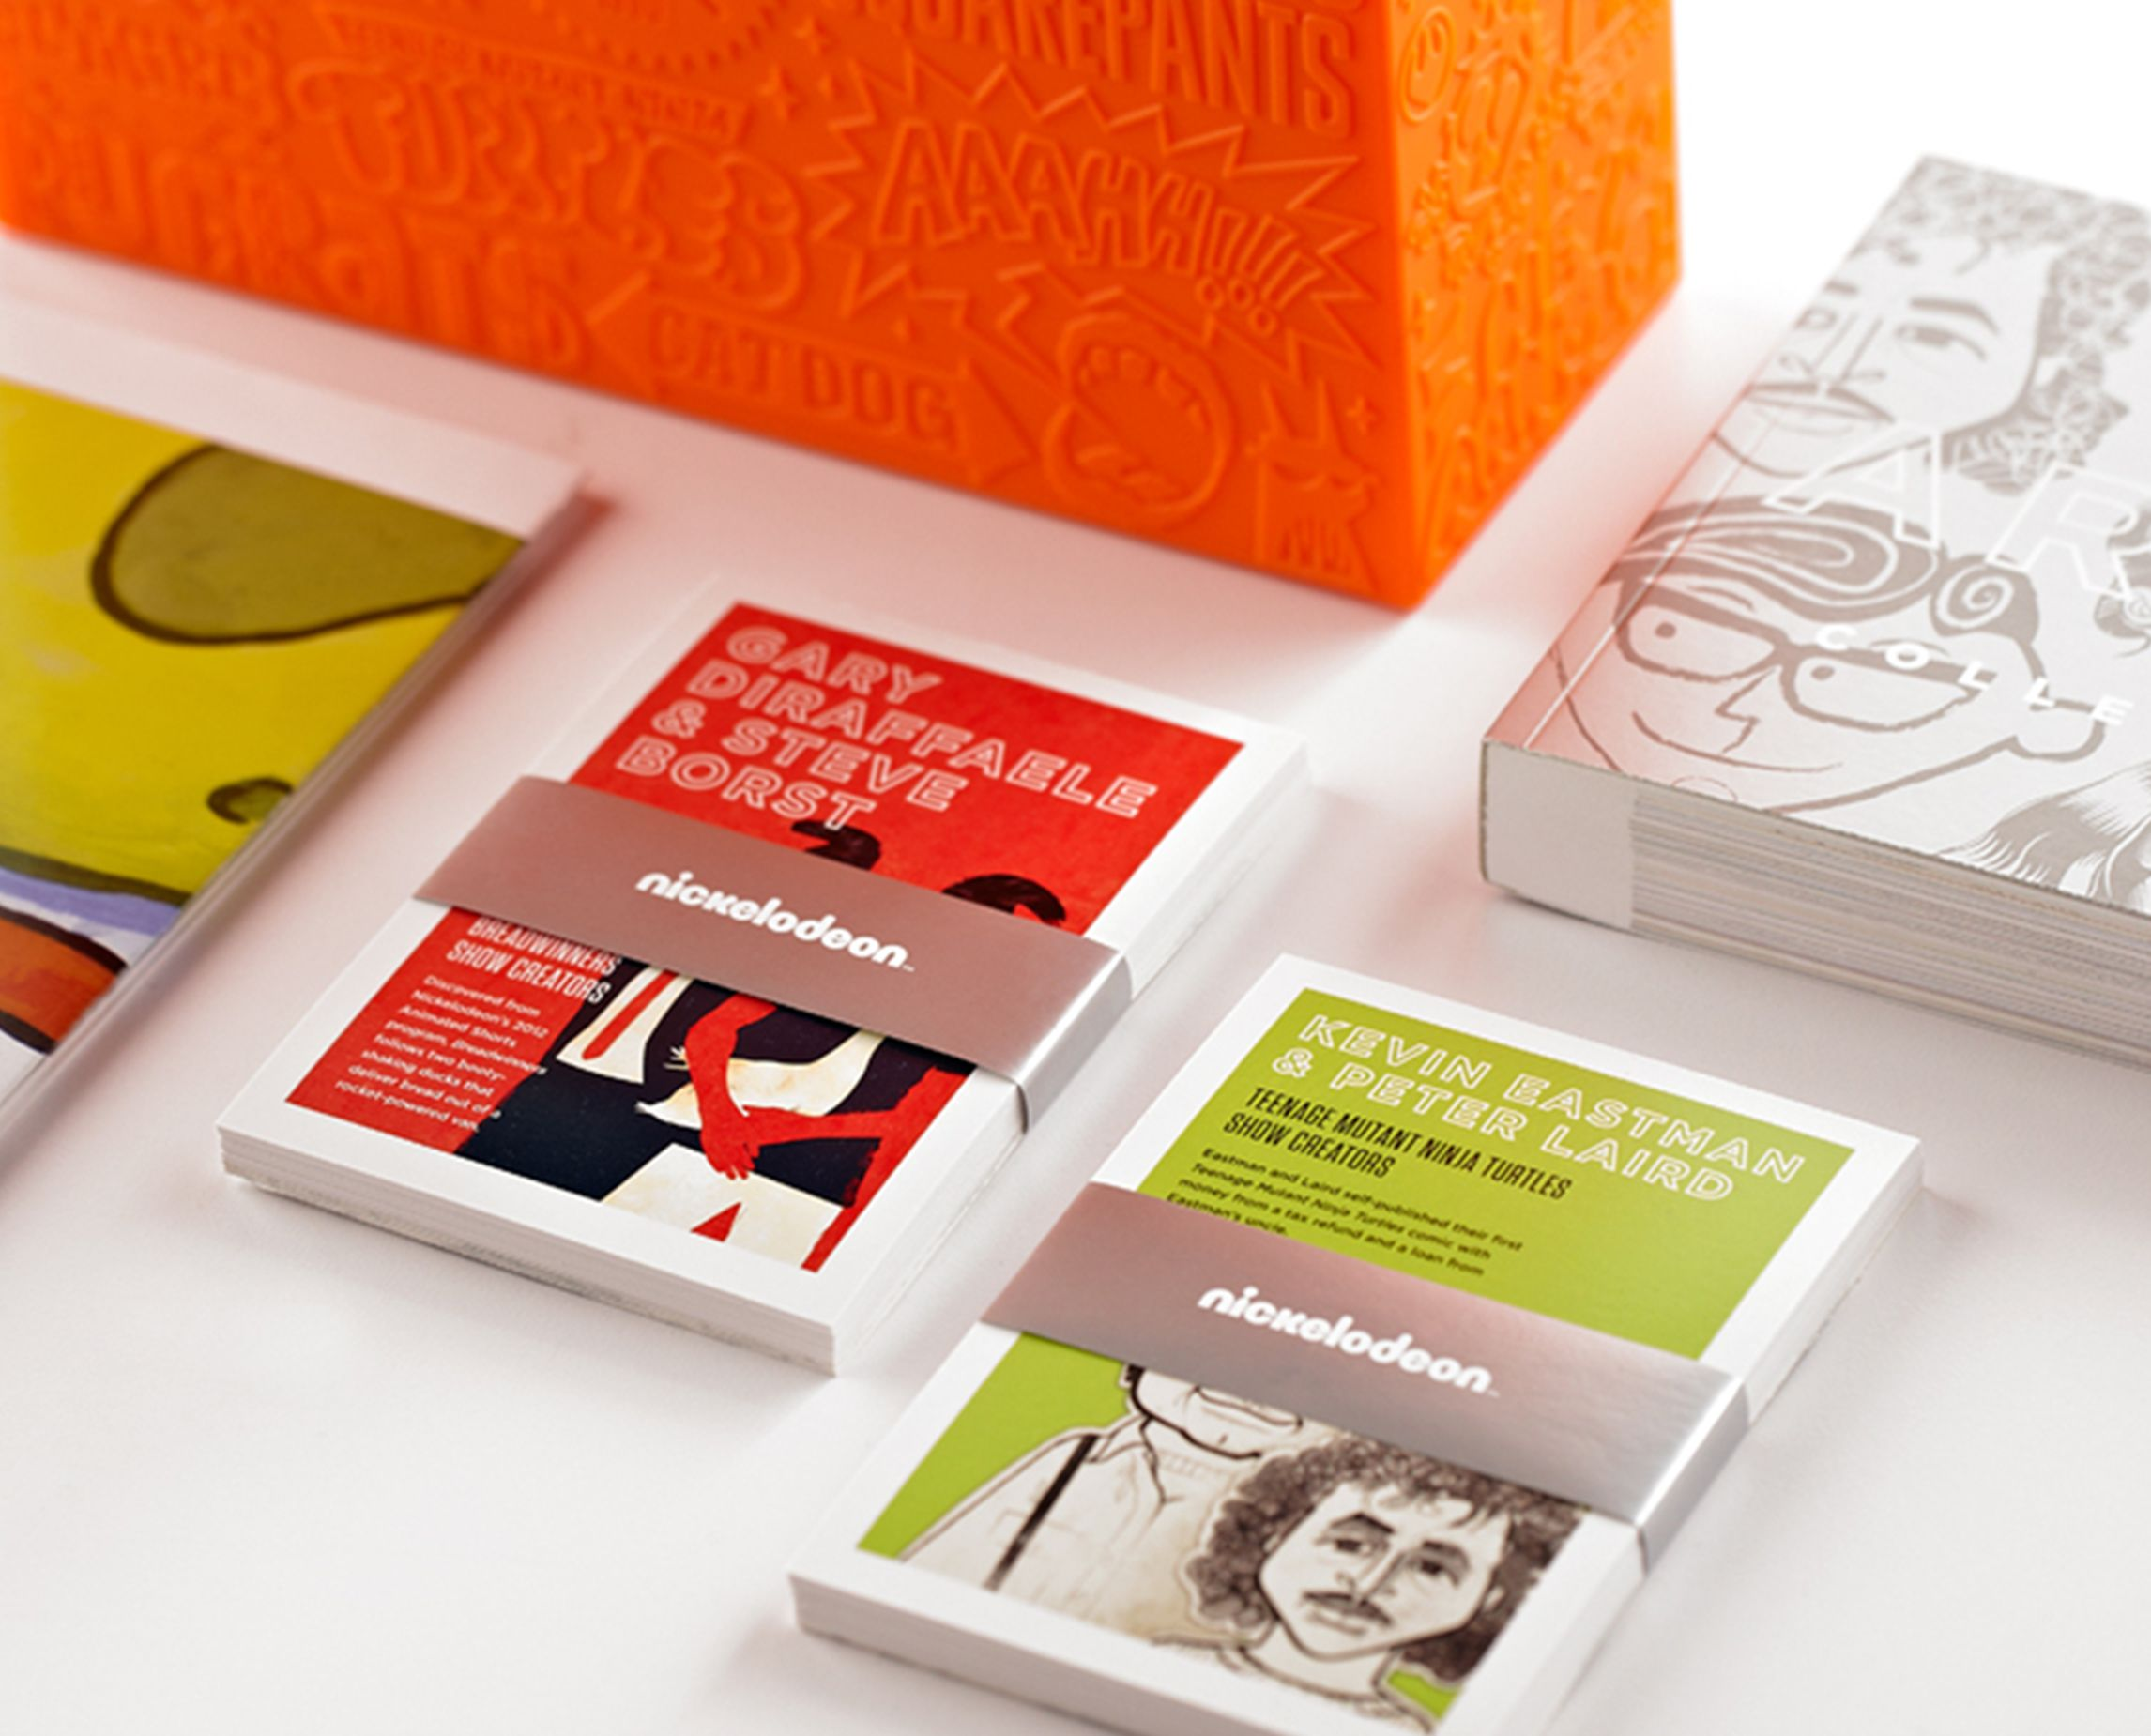 Archive Set Creator Cards